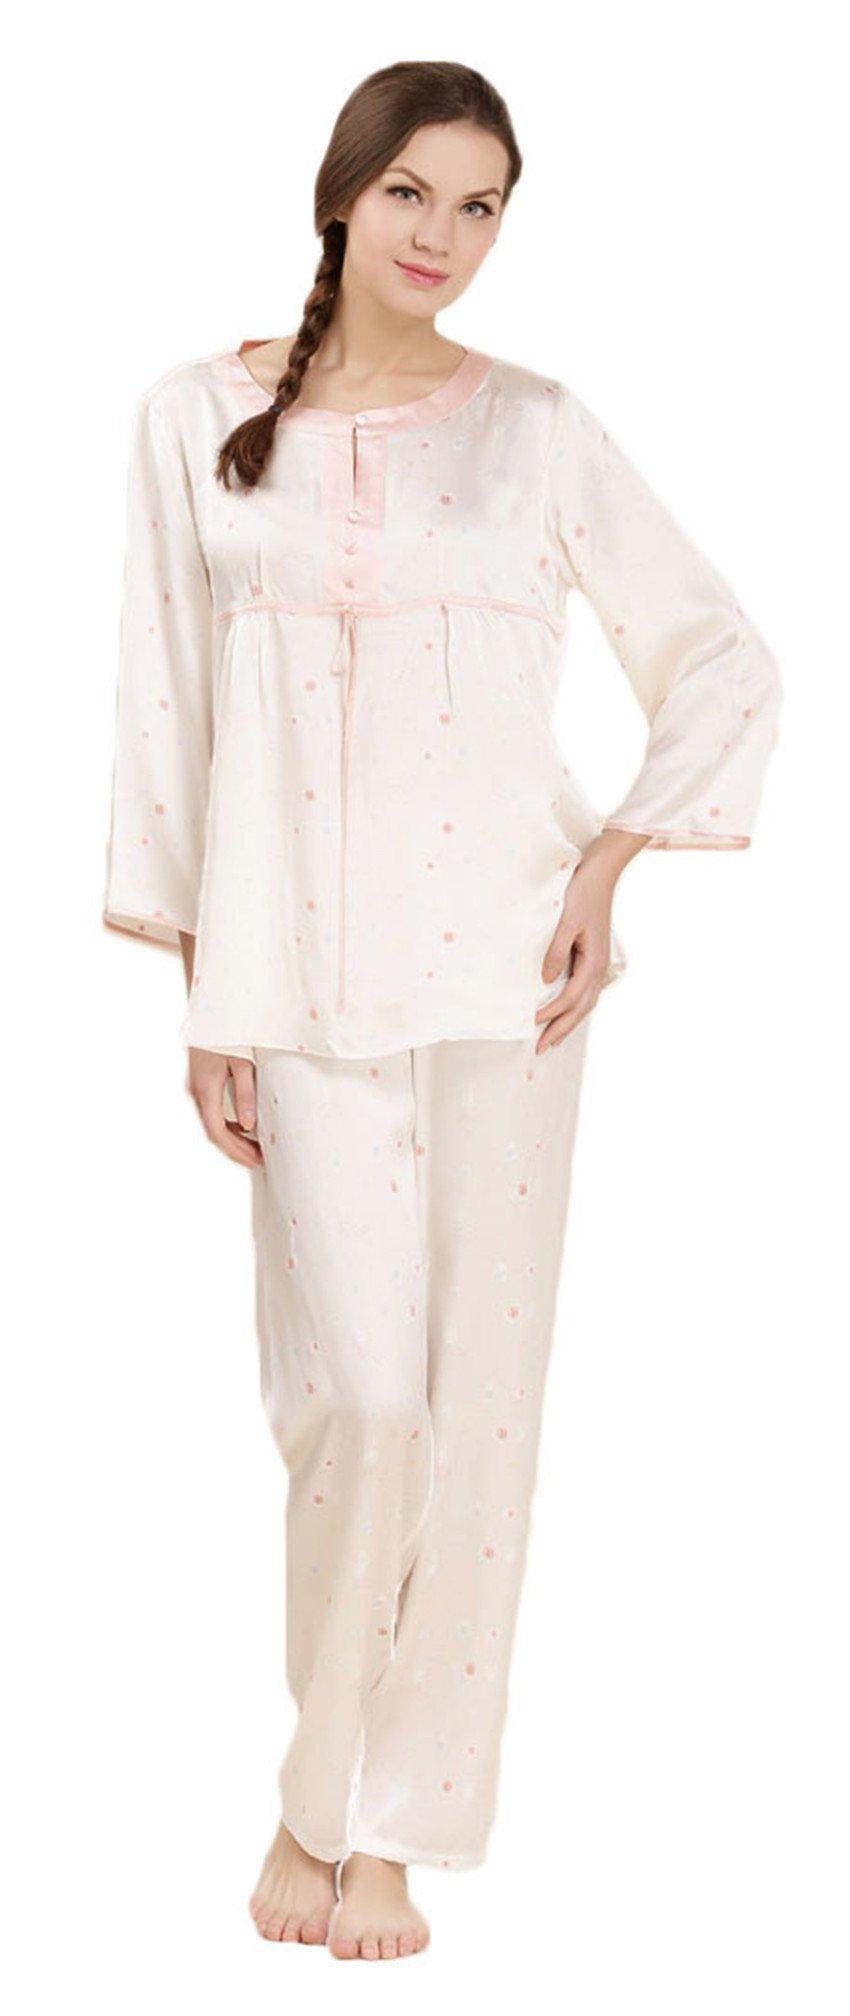 Women's Pure Mulberry Silk Pajama Set 3/4 Sleeve Crew Neck Classic Sleepwear fen XXL